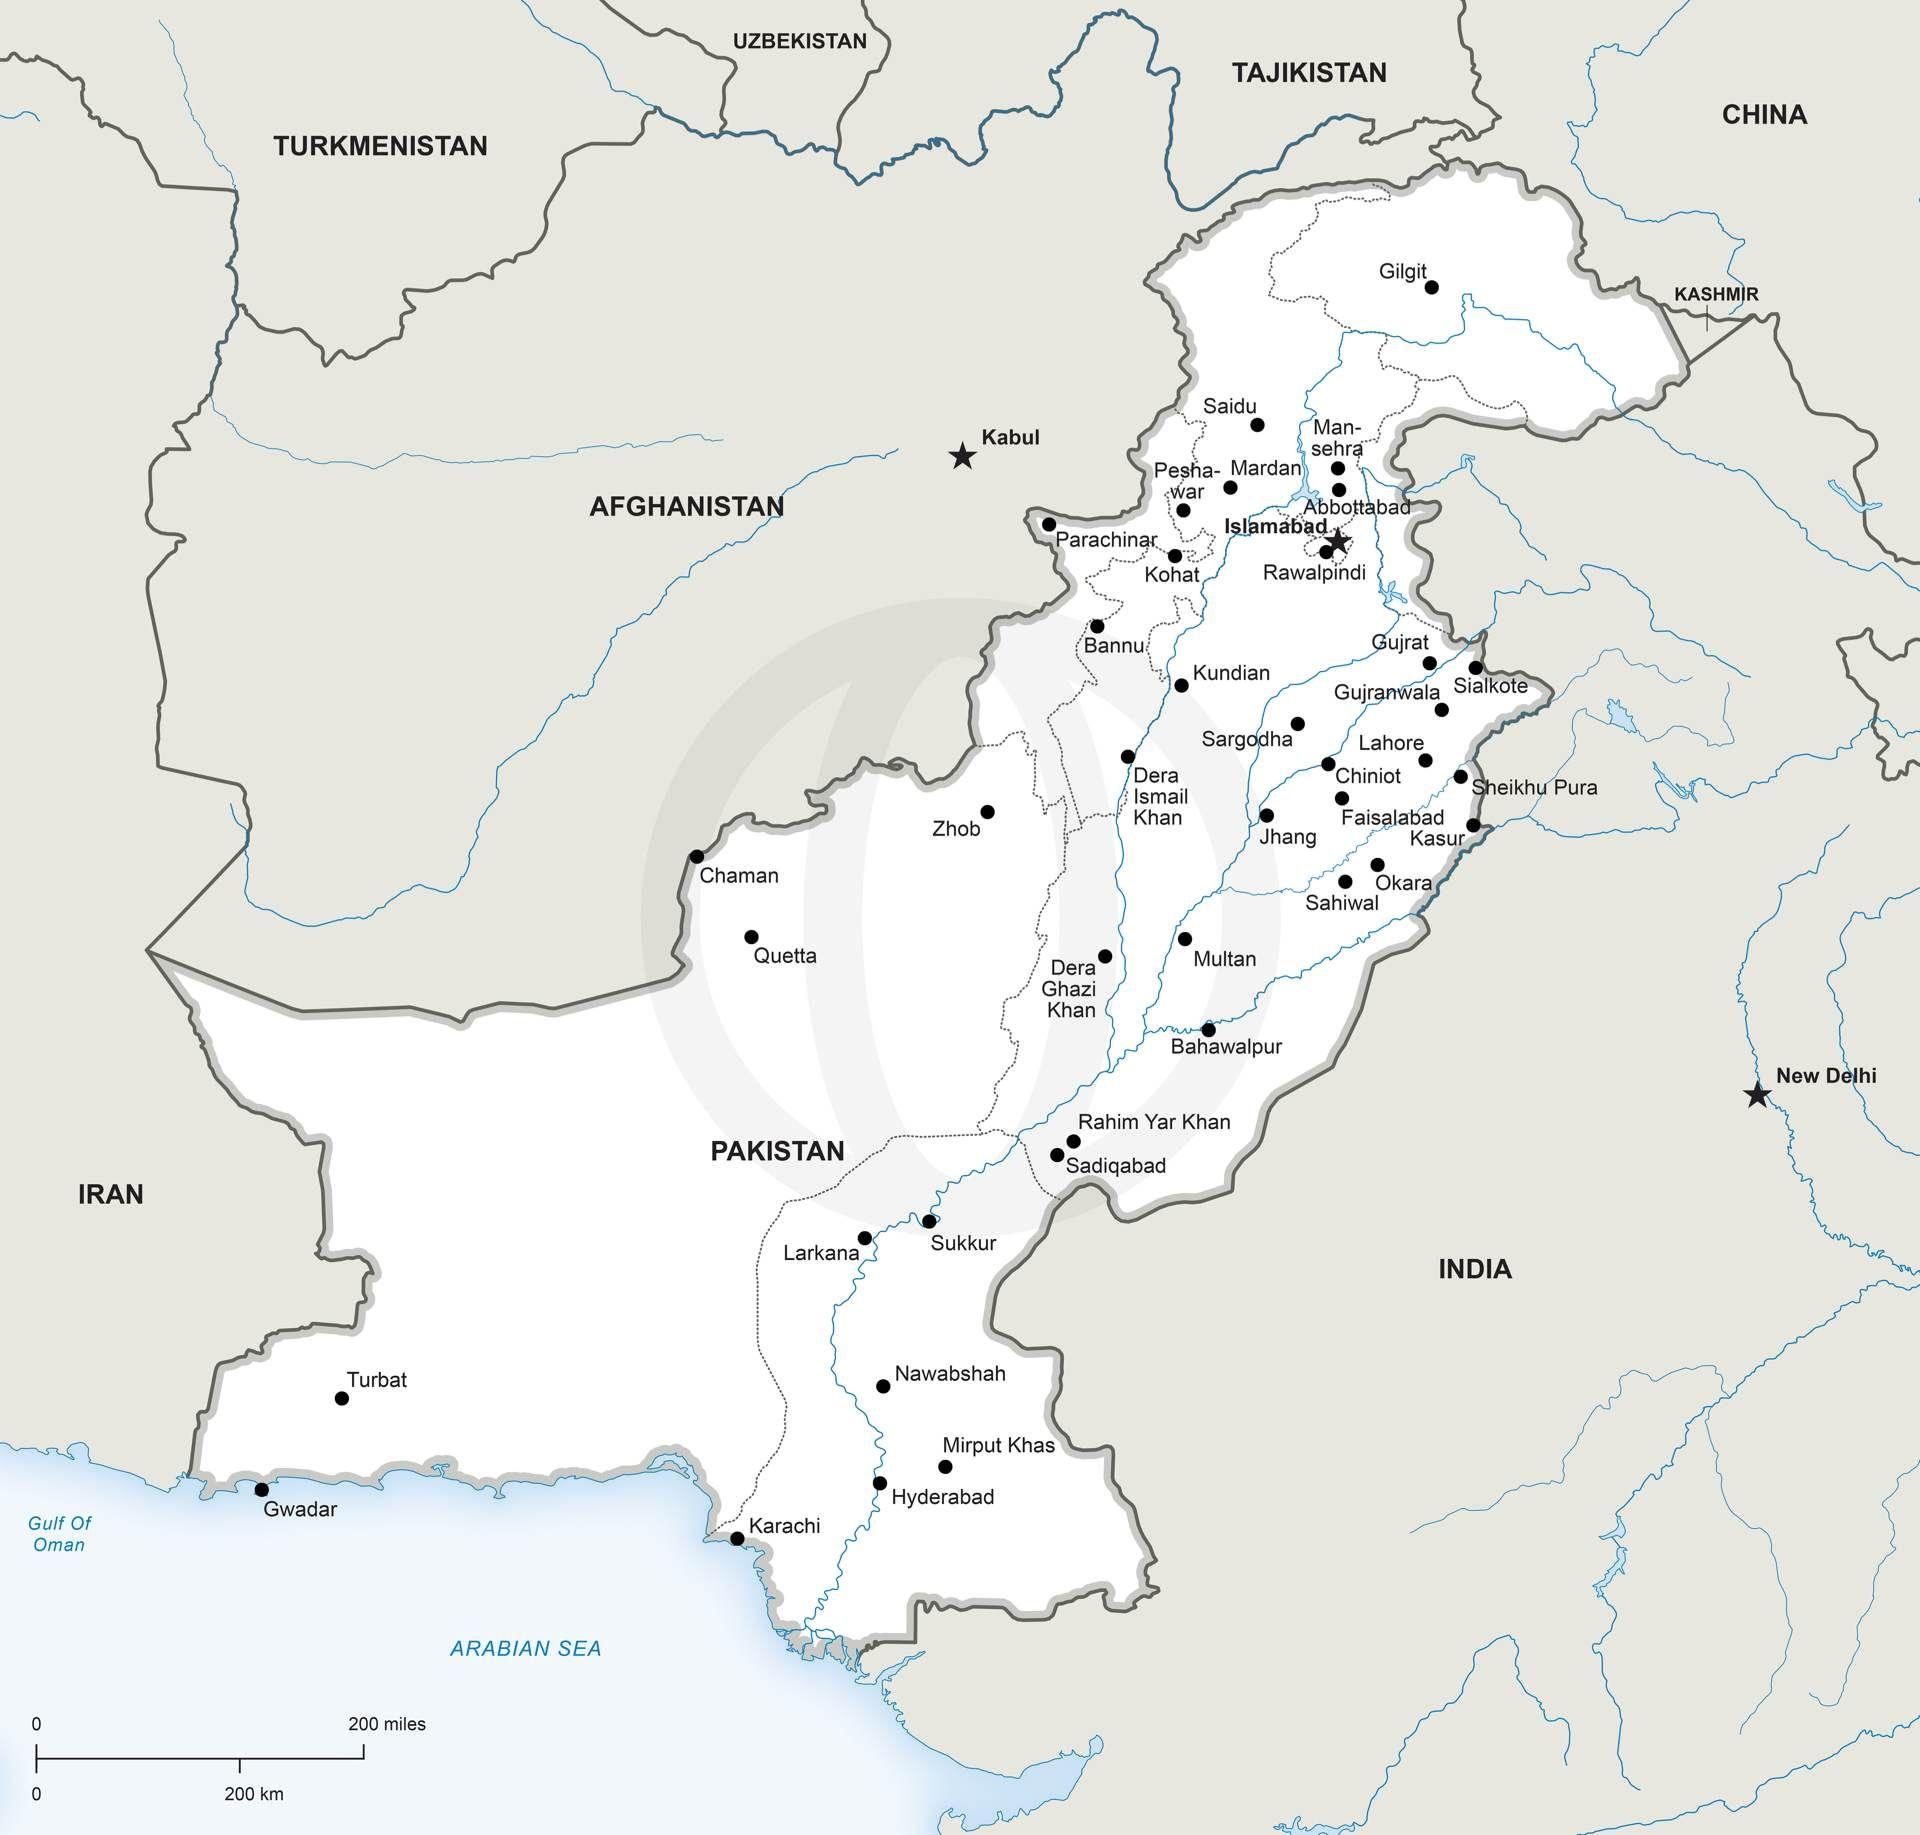 Map of stan political   stan map, Asia map, Map vector Download Hyderabad Map on islamabad map, courtallam map, chhatrapati shivaji international airport map, lahore map, saddar map, south asia map, peshawar map, india map, trivandrum map, duqm map, karachi map, chennai map, assam map, colombo map, anantapur district map, ahmedabad gujarat map, myanmar map, dhaka map, magarpatta map, andhra pradesh map,